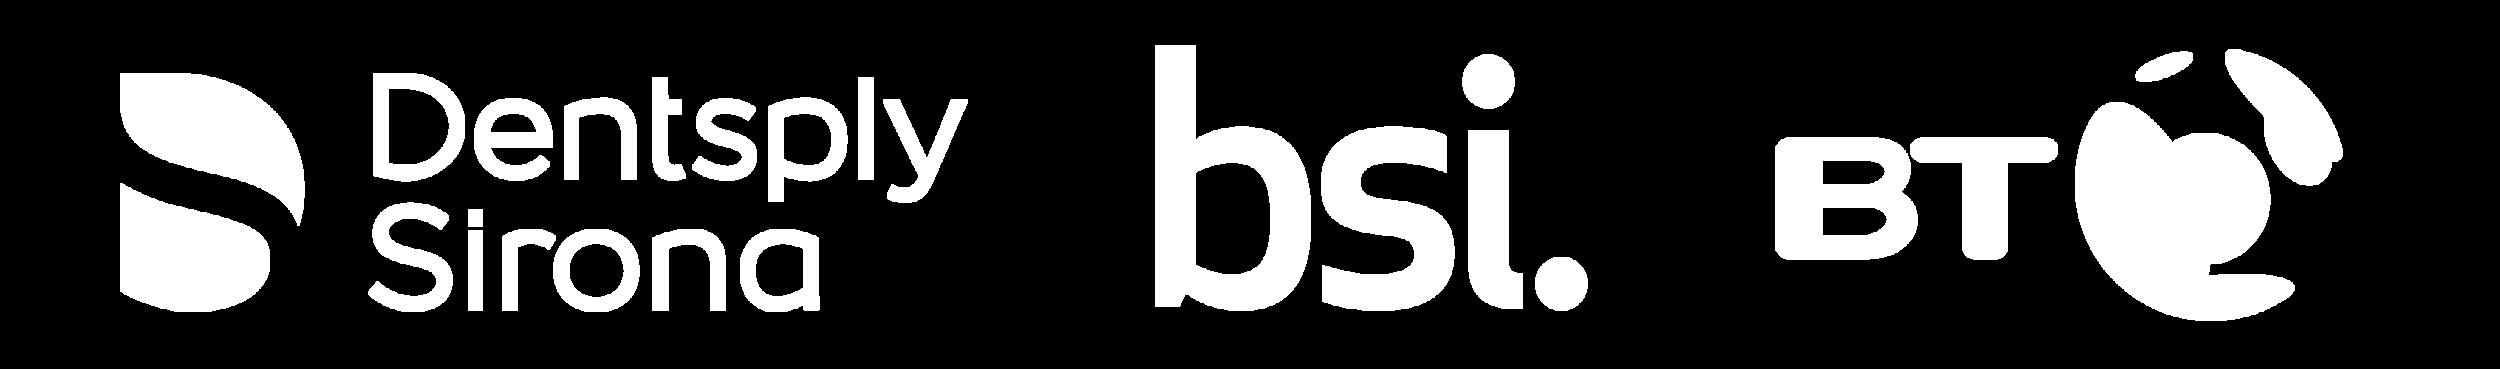 client-logos-1.png